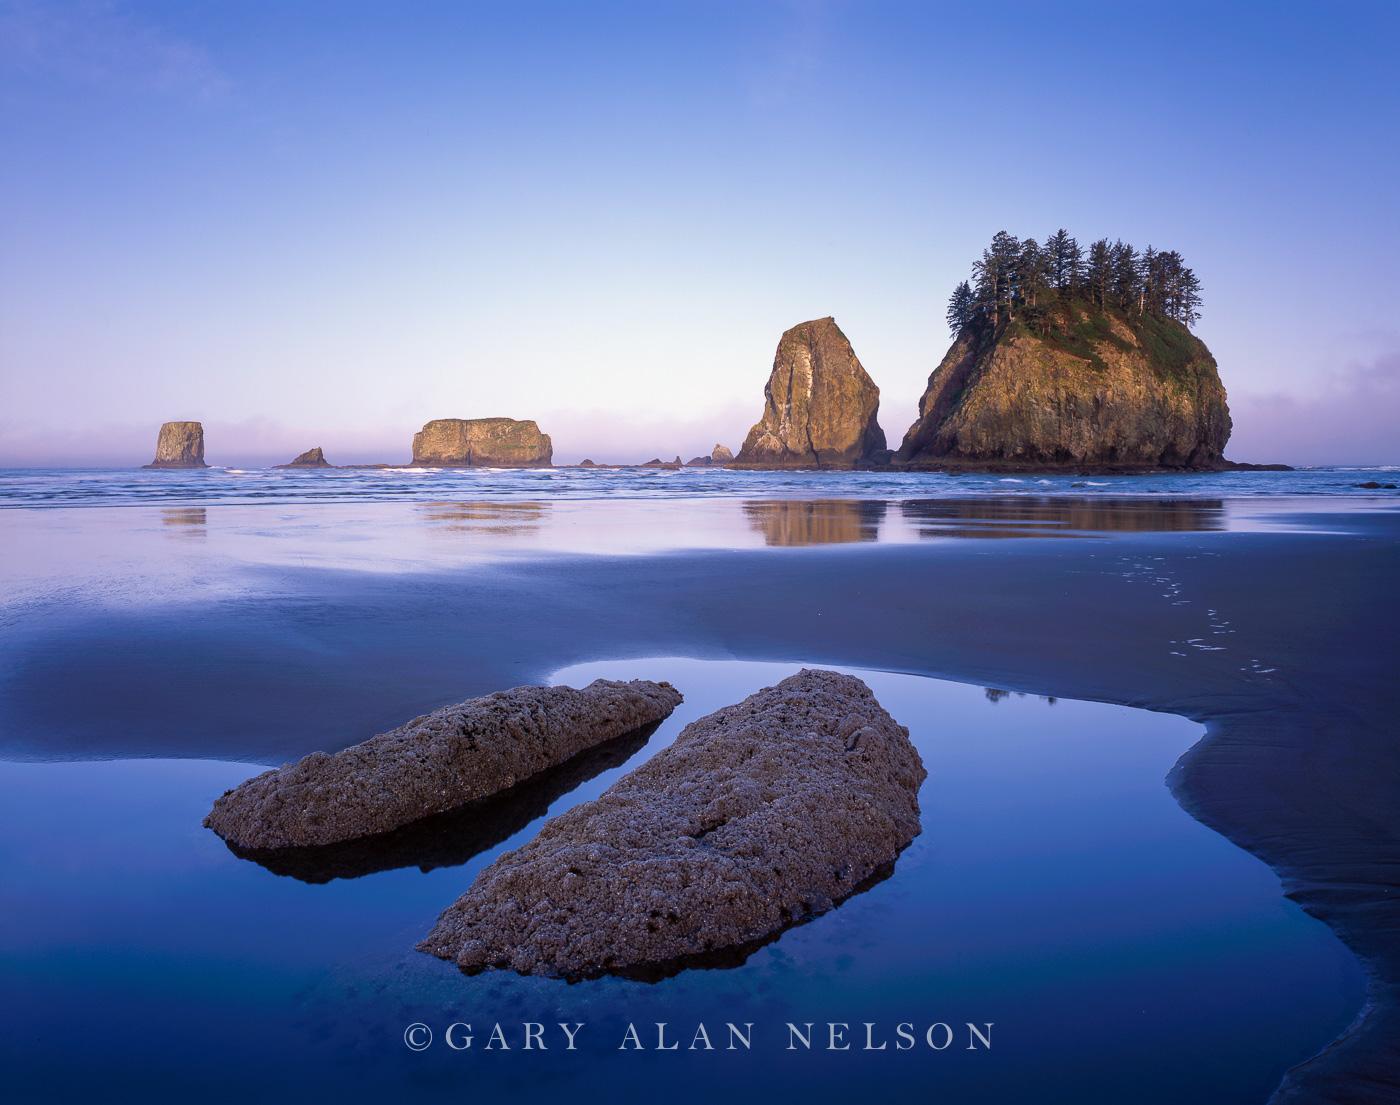 WA-98-5-NP Tide pools and seastacks on the Pacifi Ocean, Olympic National Park, Washington